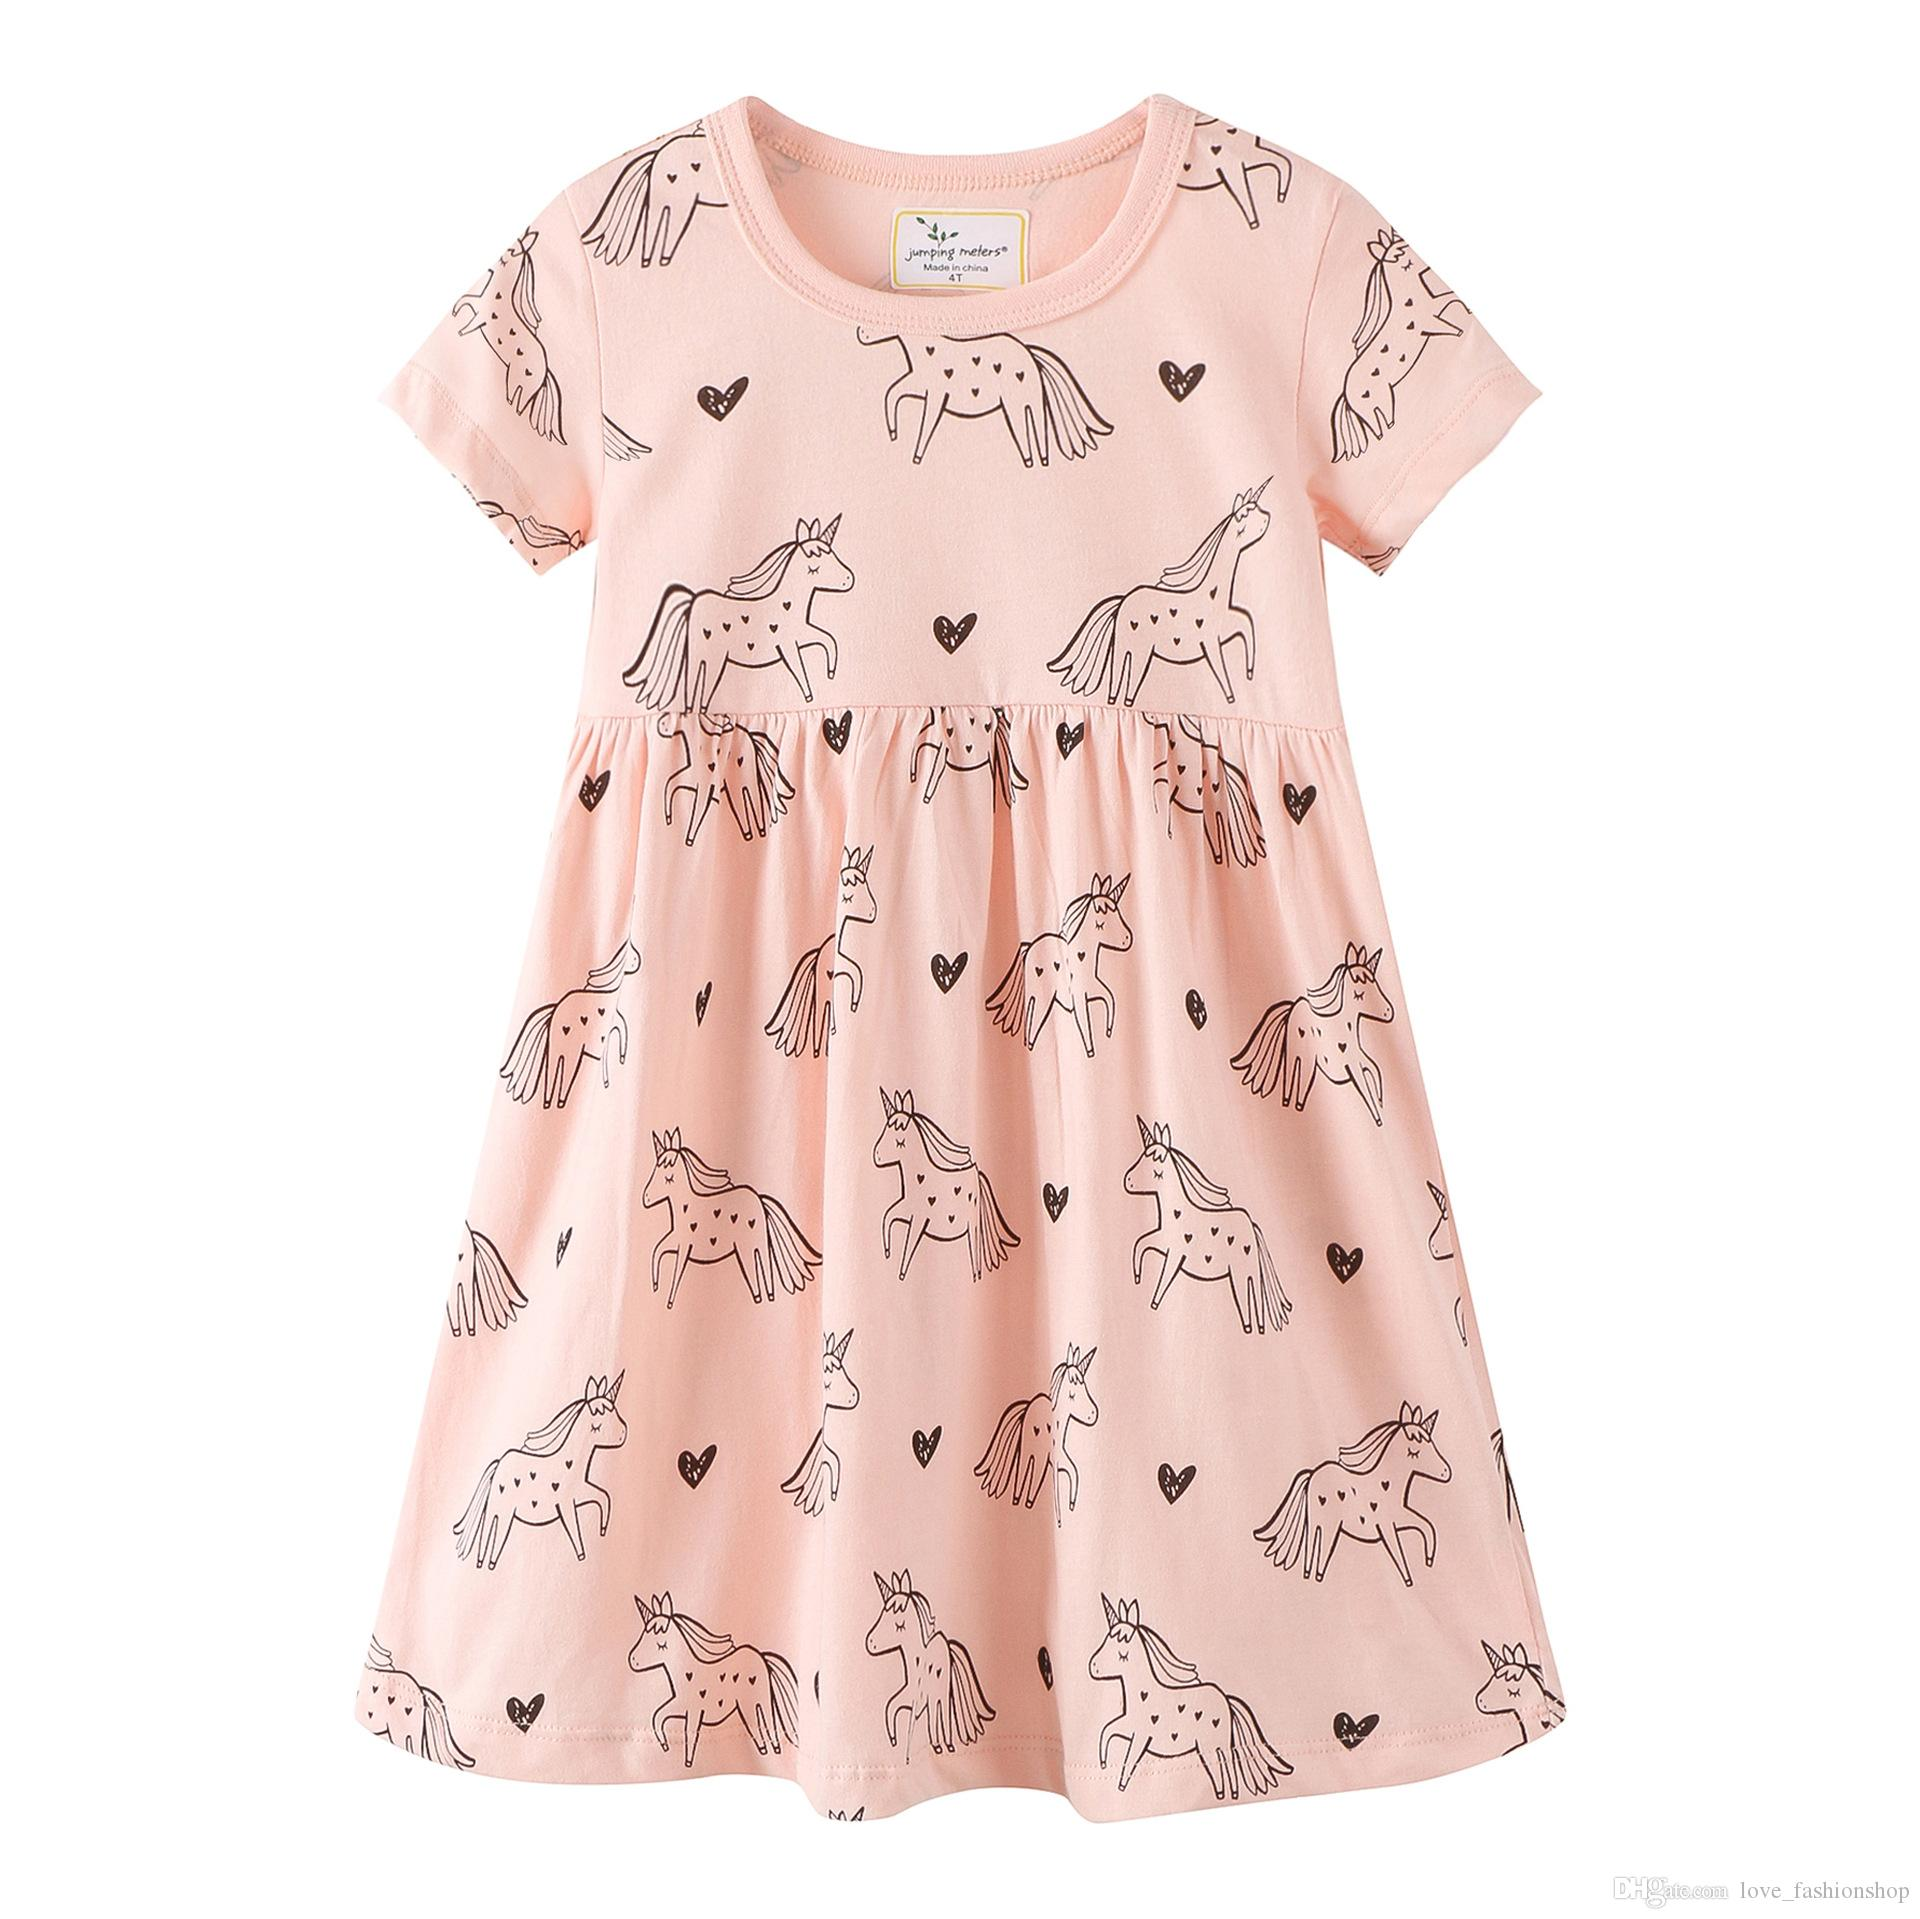 ba532377a9 2019 2019 New Girls Unicorn Printed Dress Summer Baby Kids Horse Cotton  Cartoon Princess Dresses A Line Ruffle Skirt Children Casual Wear Clothes  From ...